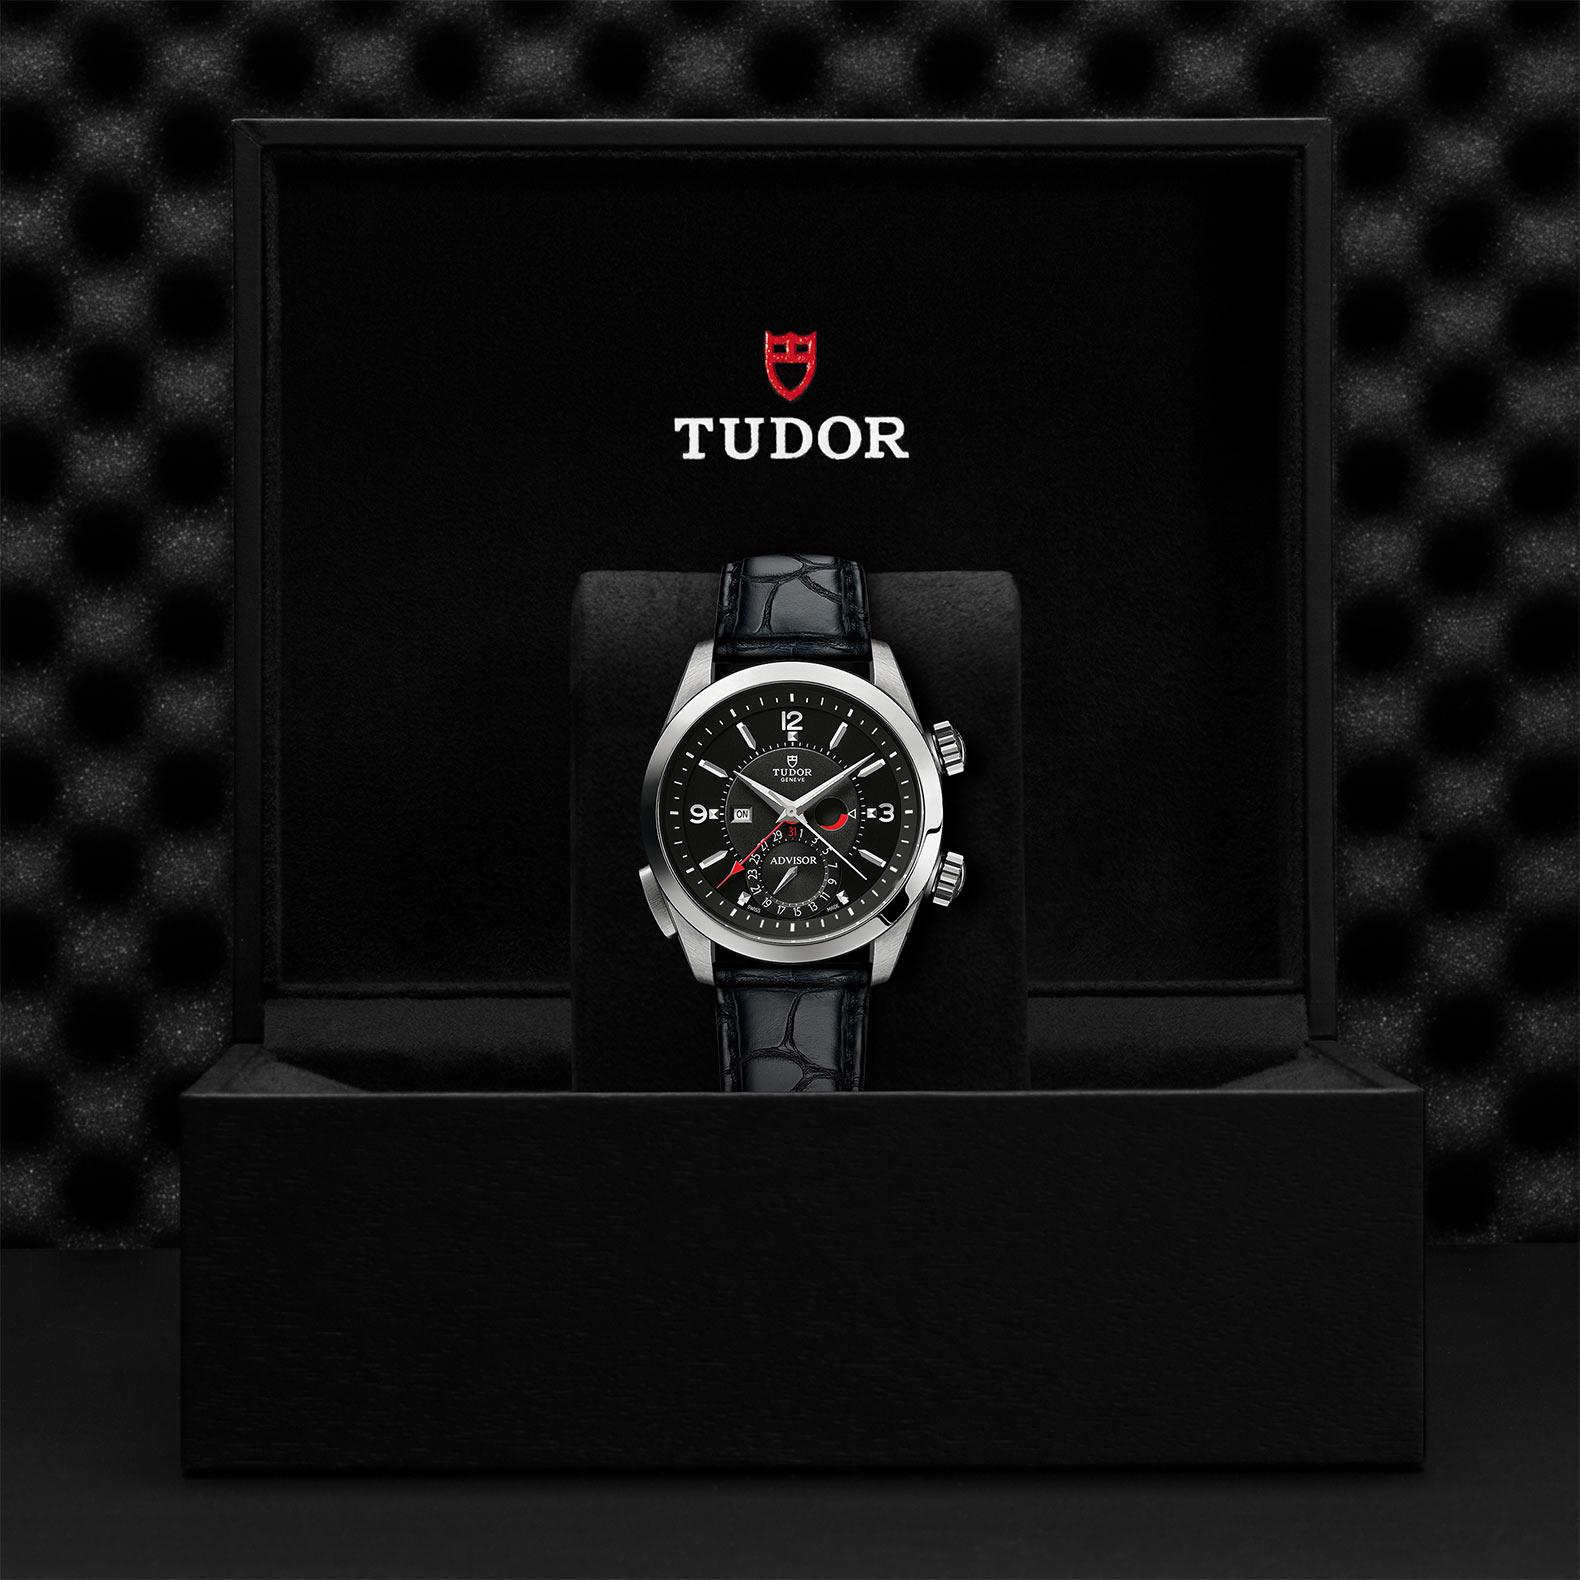 TUDOR Heritage Advisor - M79620TN-0006